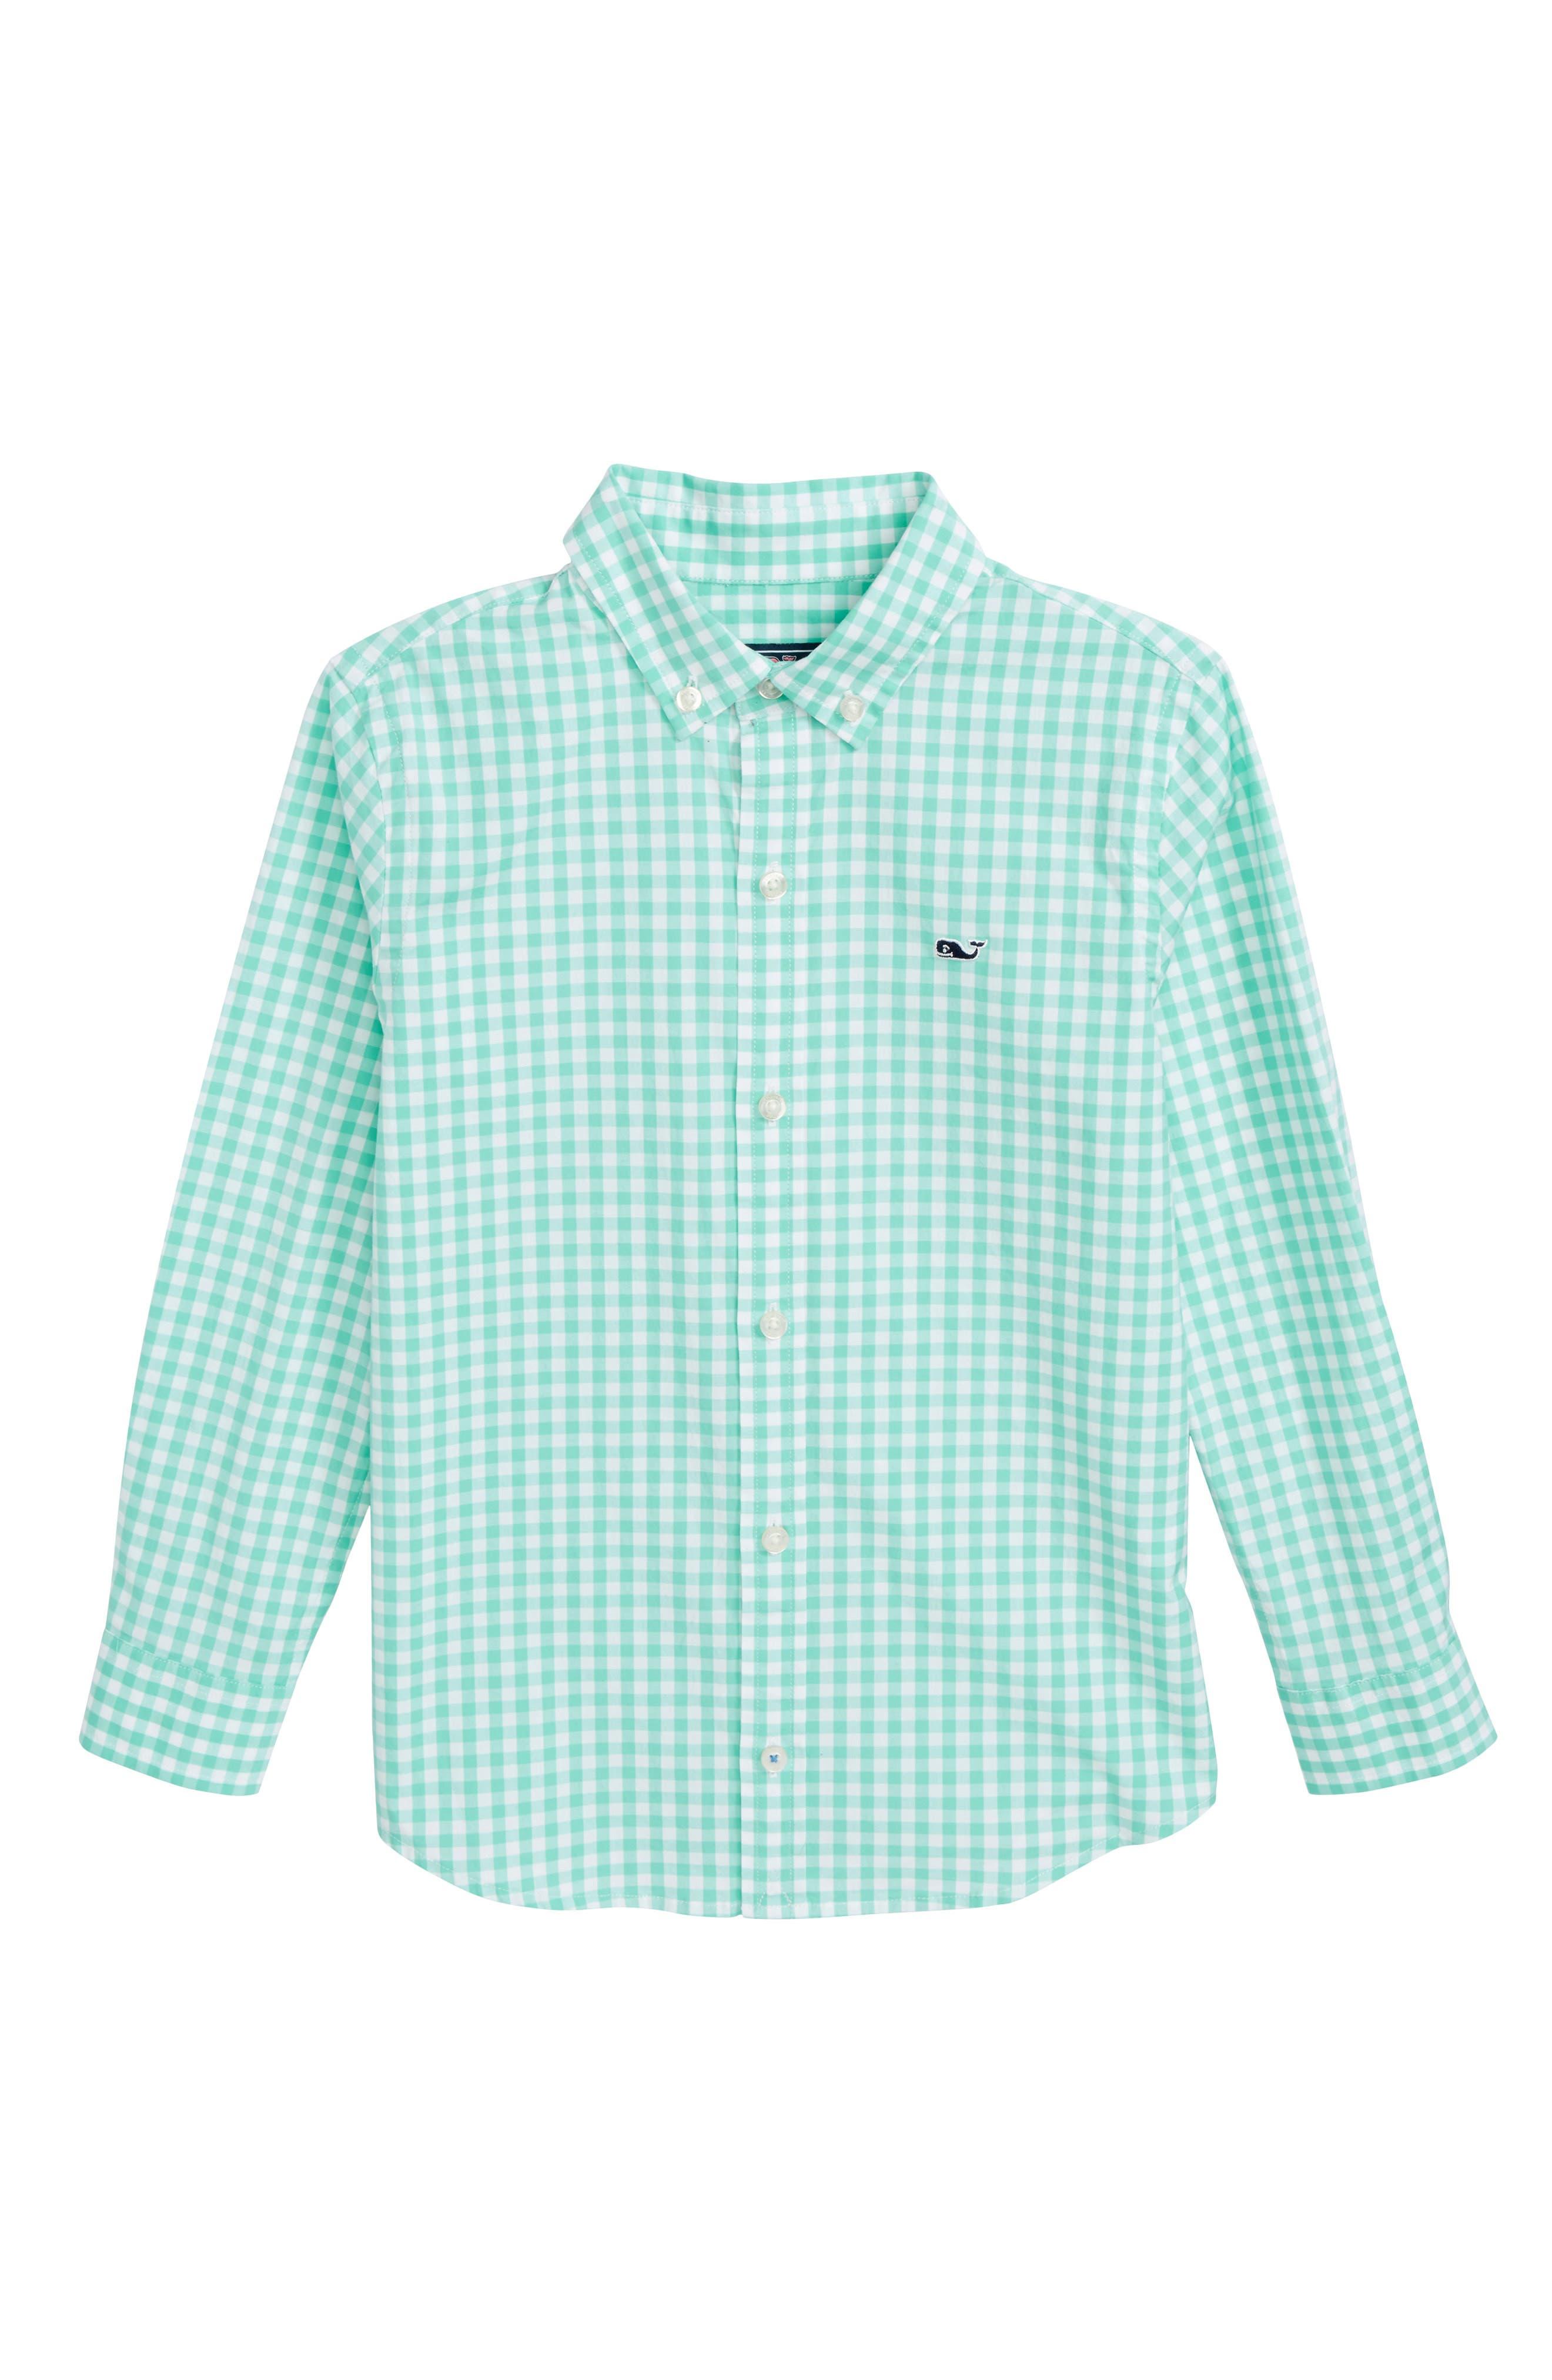 Carleton Gingham Shirt,                             Main thumbnail 1, color,